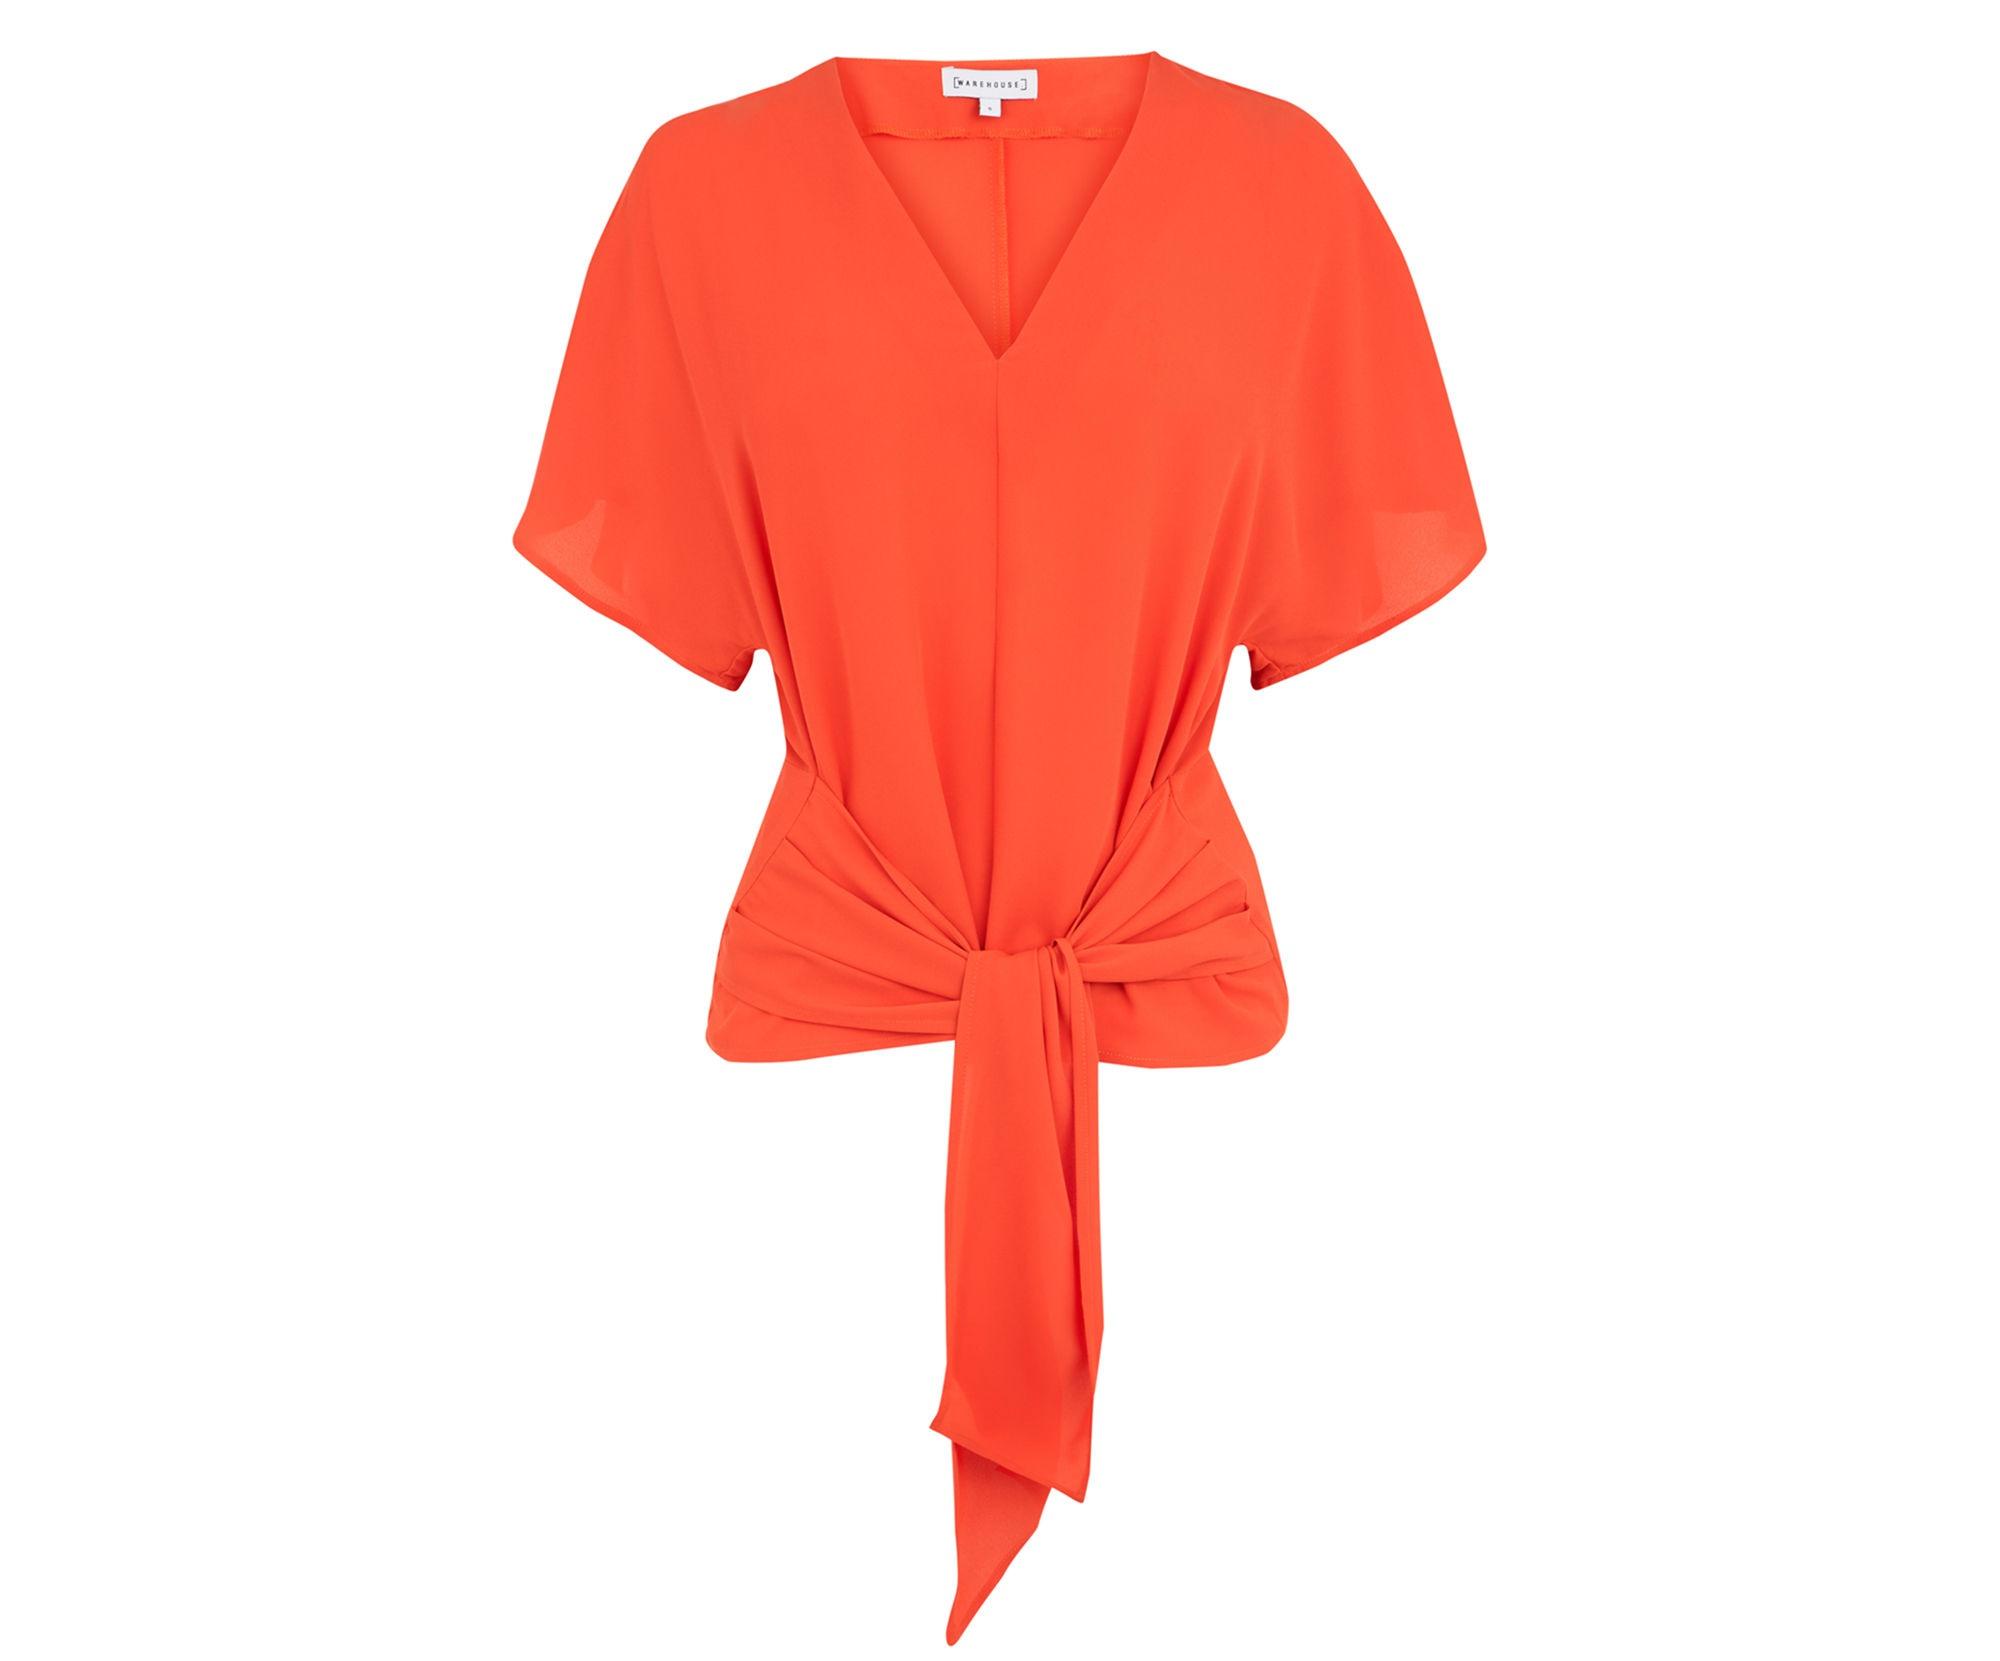 warehouse orange top